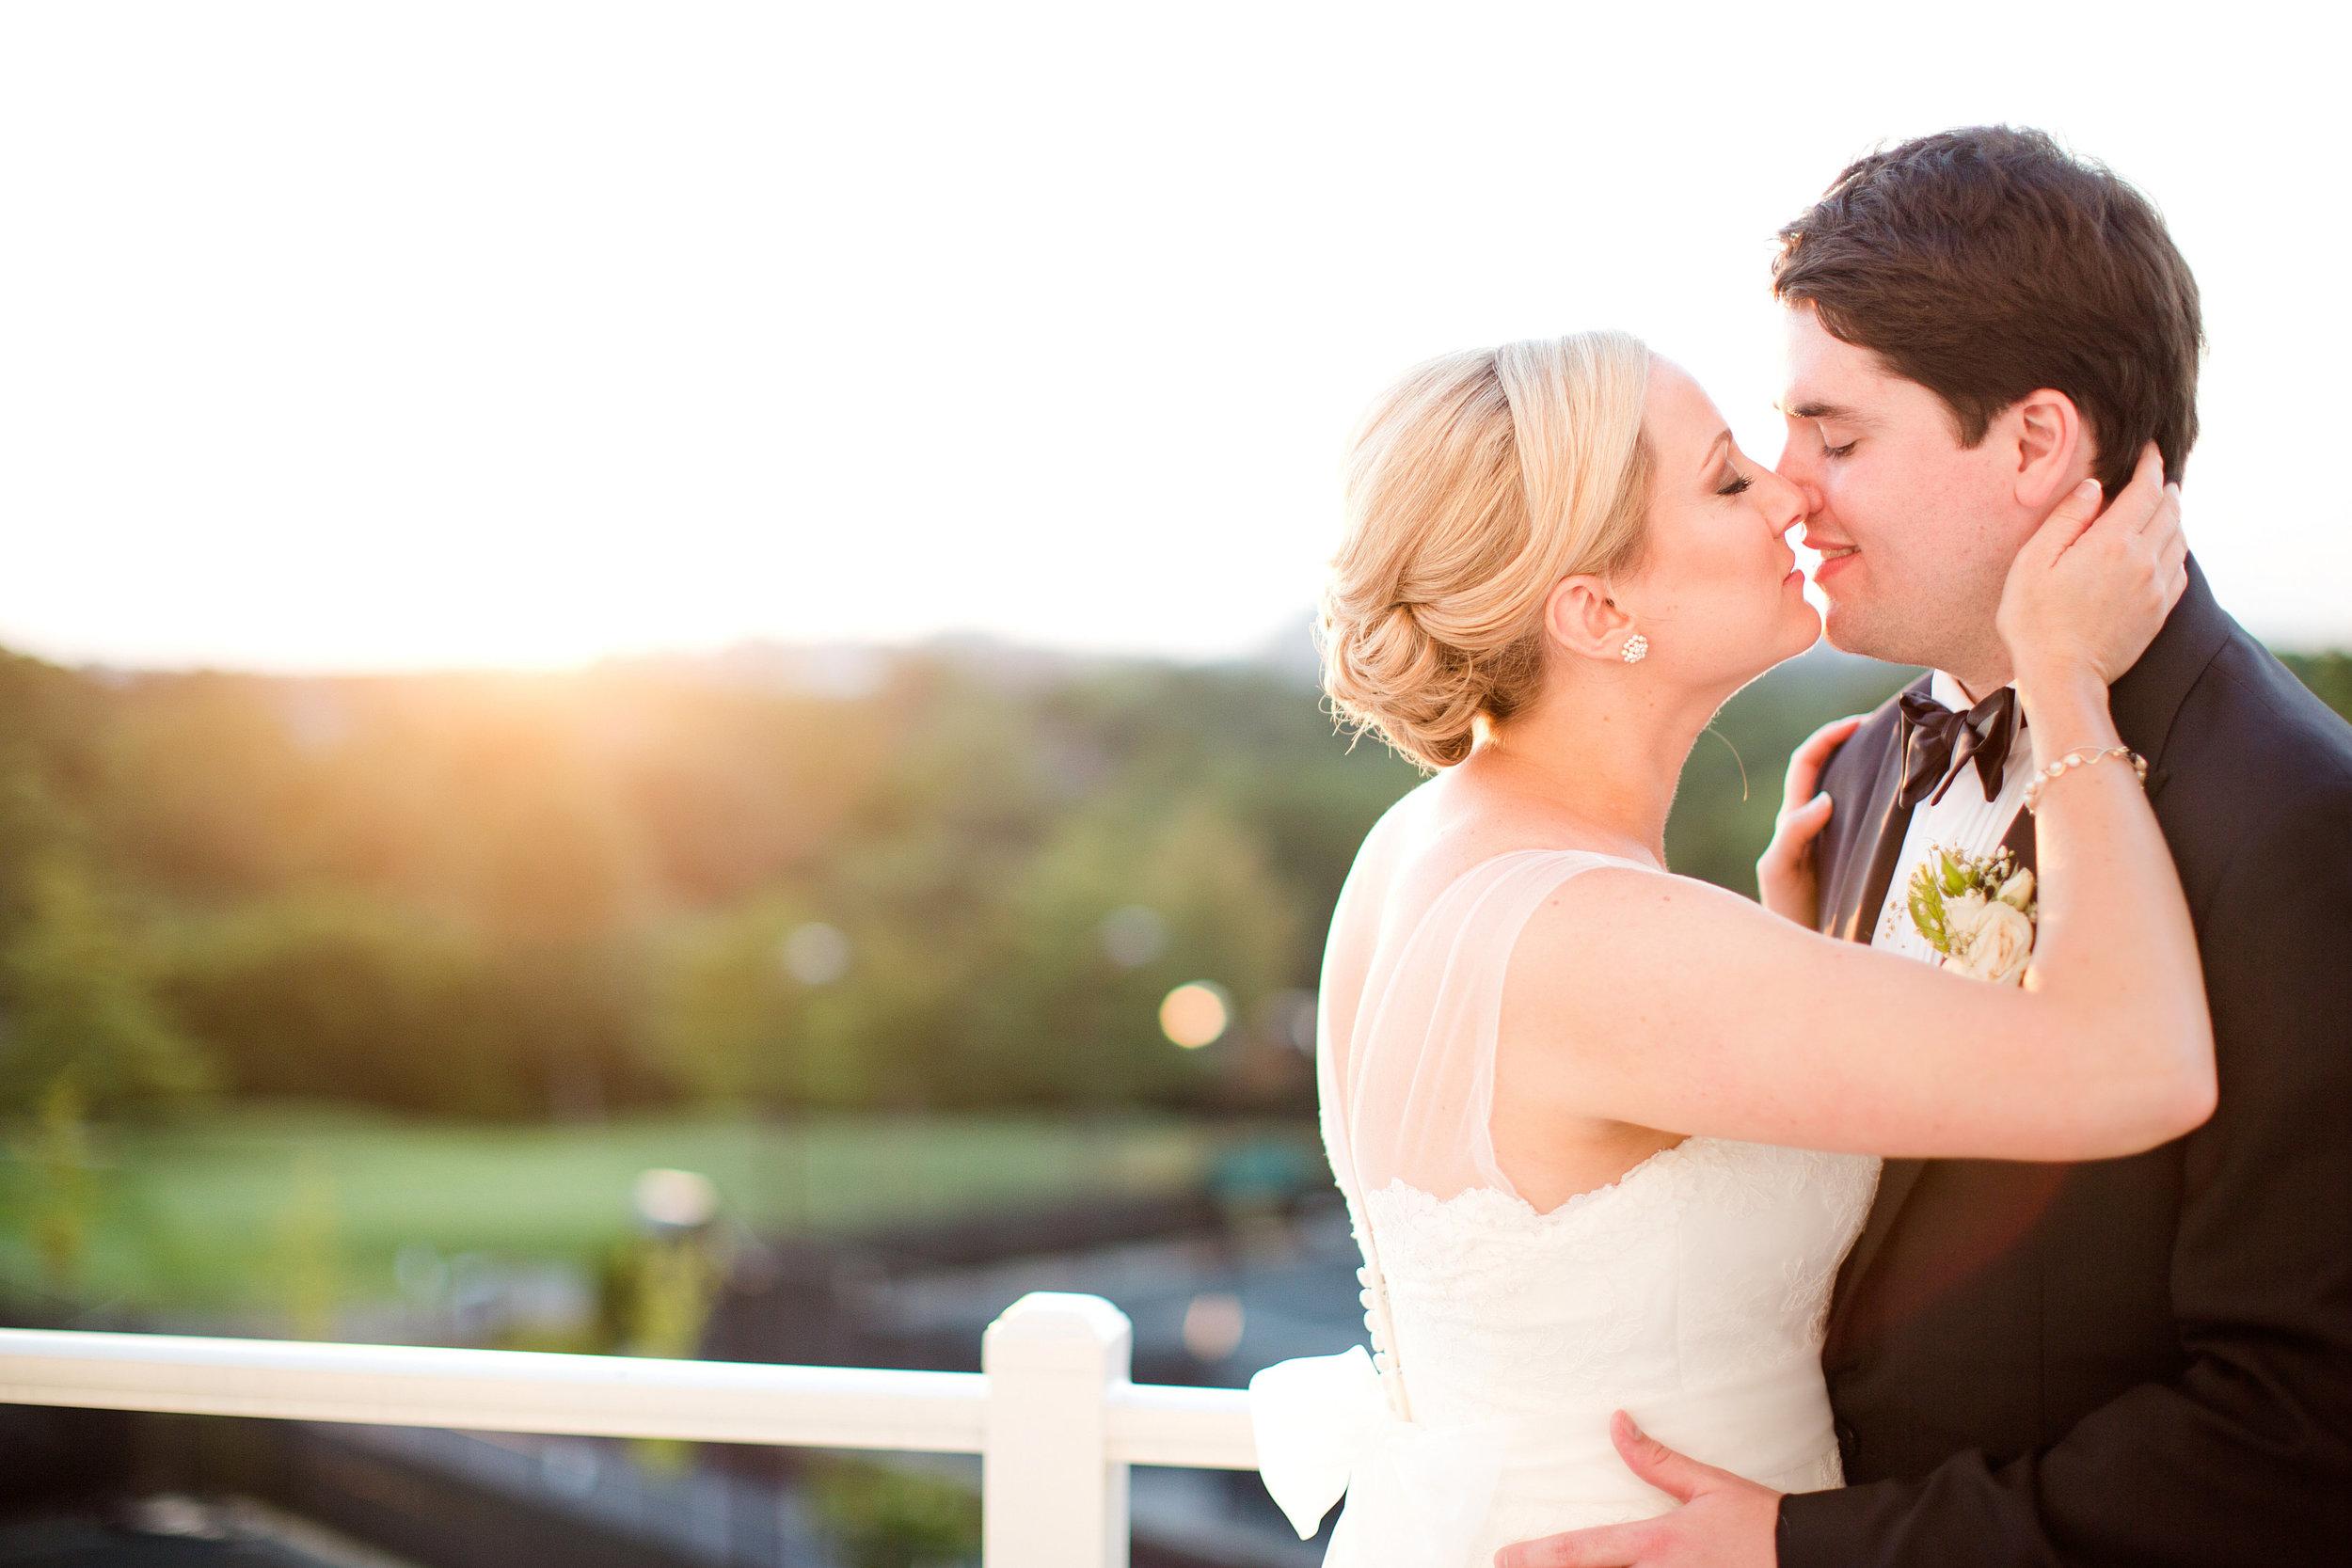 View More: http://katelynjames.pass.us/dan-and-kathleen-wedding